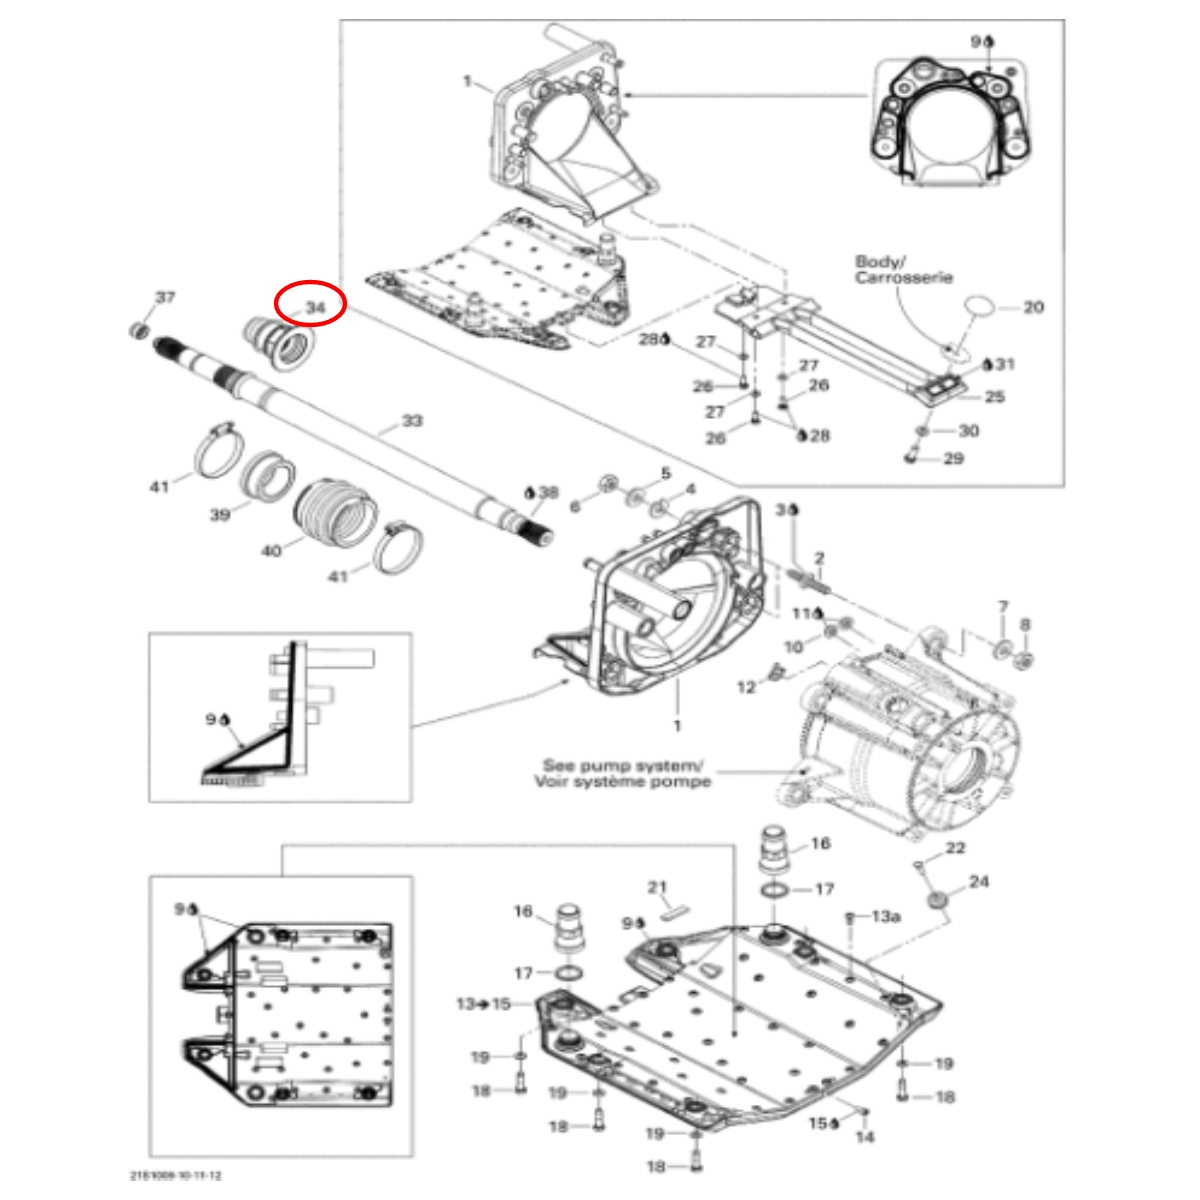 Bucha Inox Anel Carbono para Jet Ski Sea Doo 4 TEC IS  - Radical Peças - Peças para Jet Ski